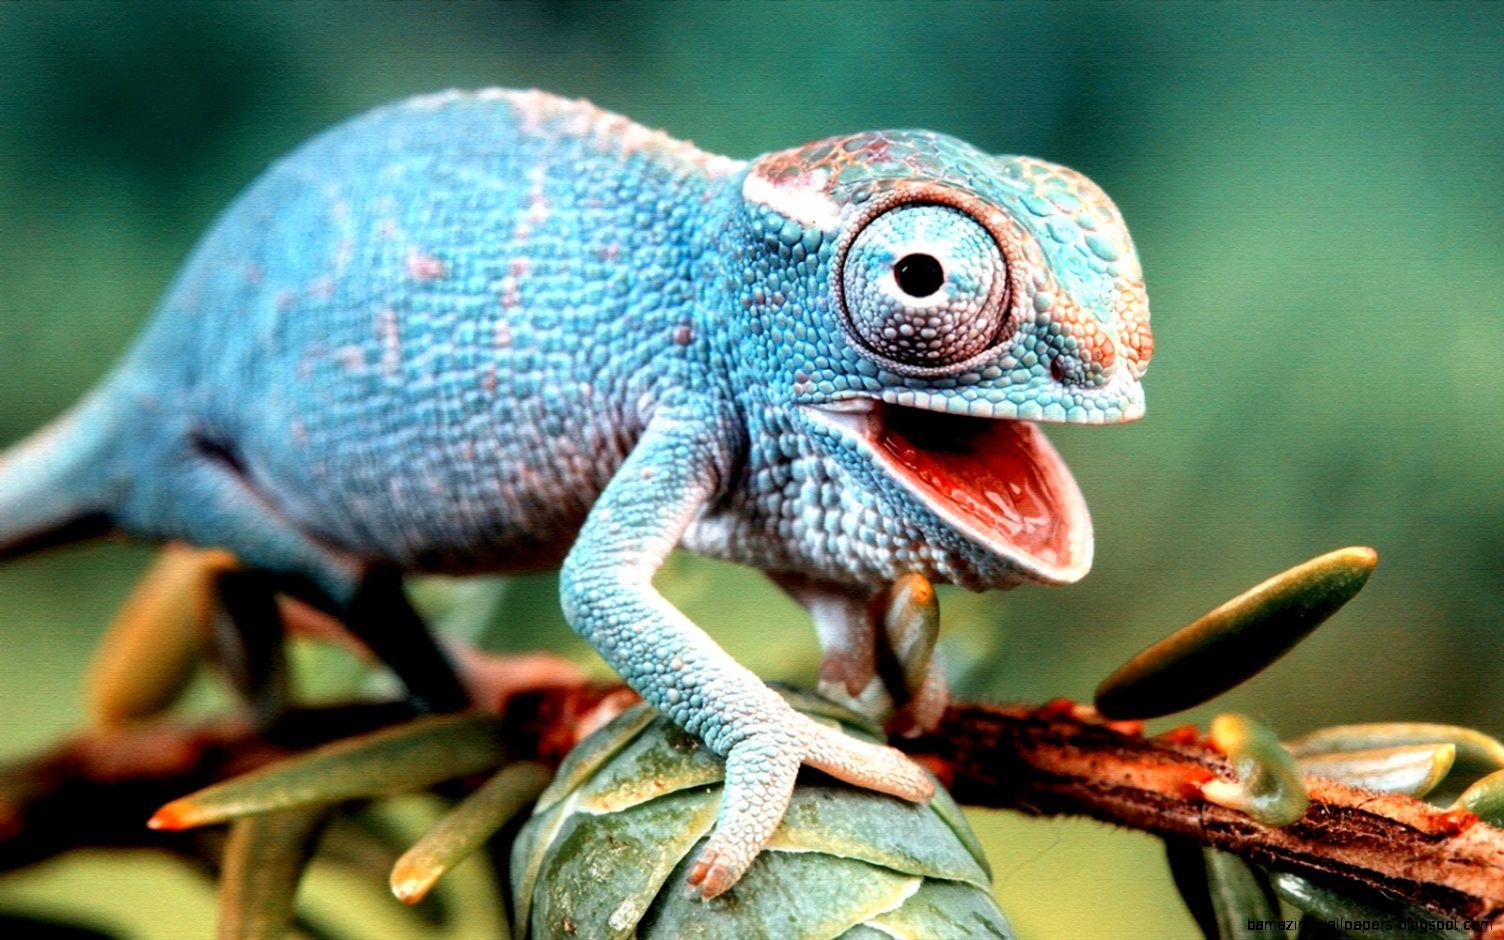 Cute Lizard Wallpaper | Amazing Wallpapers